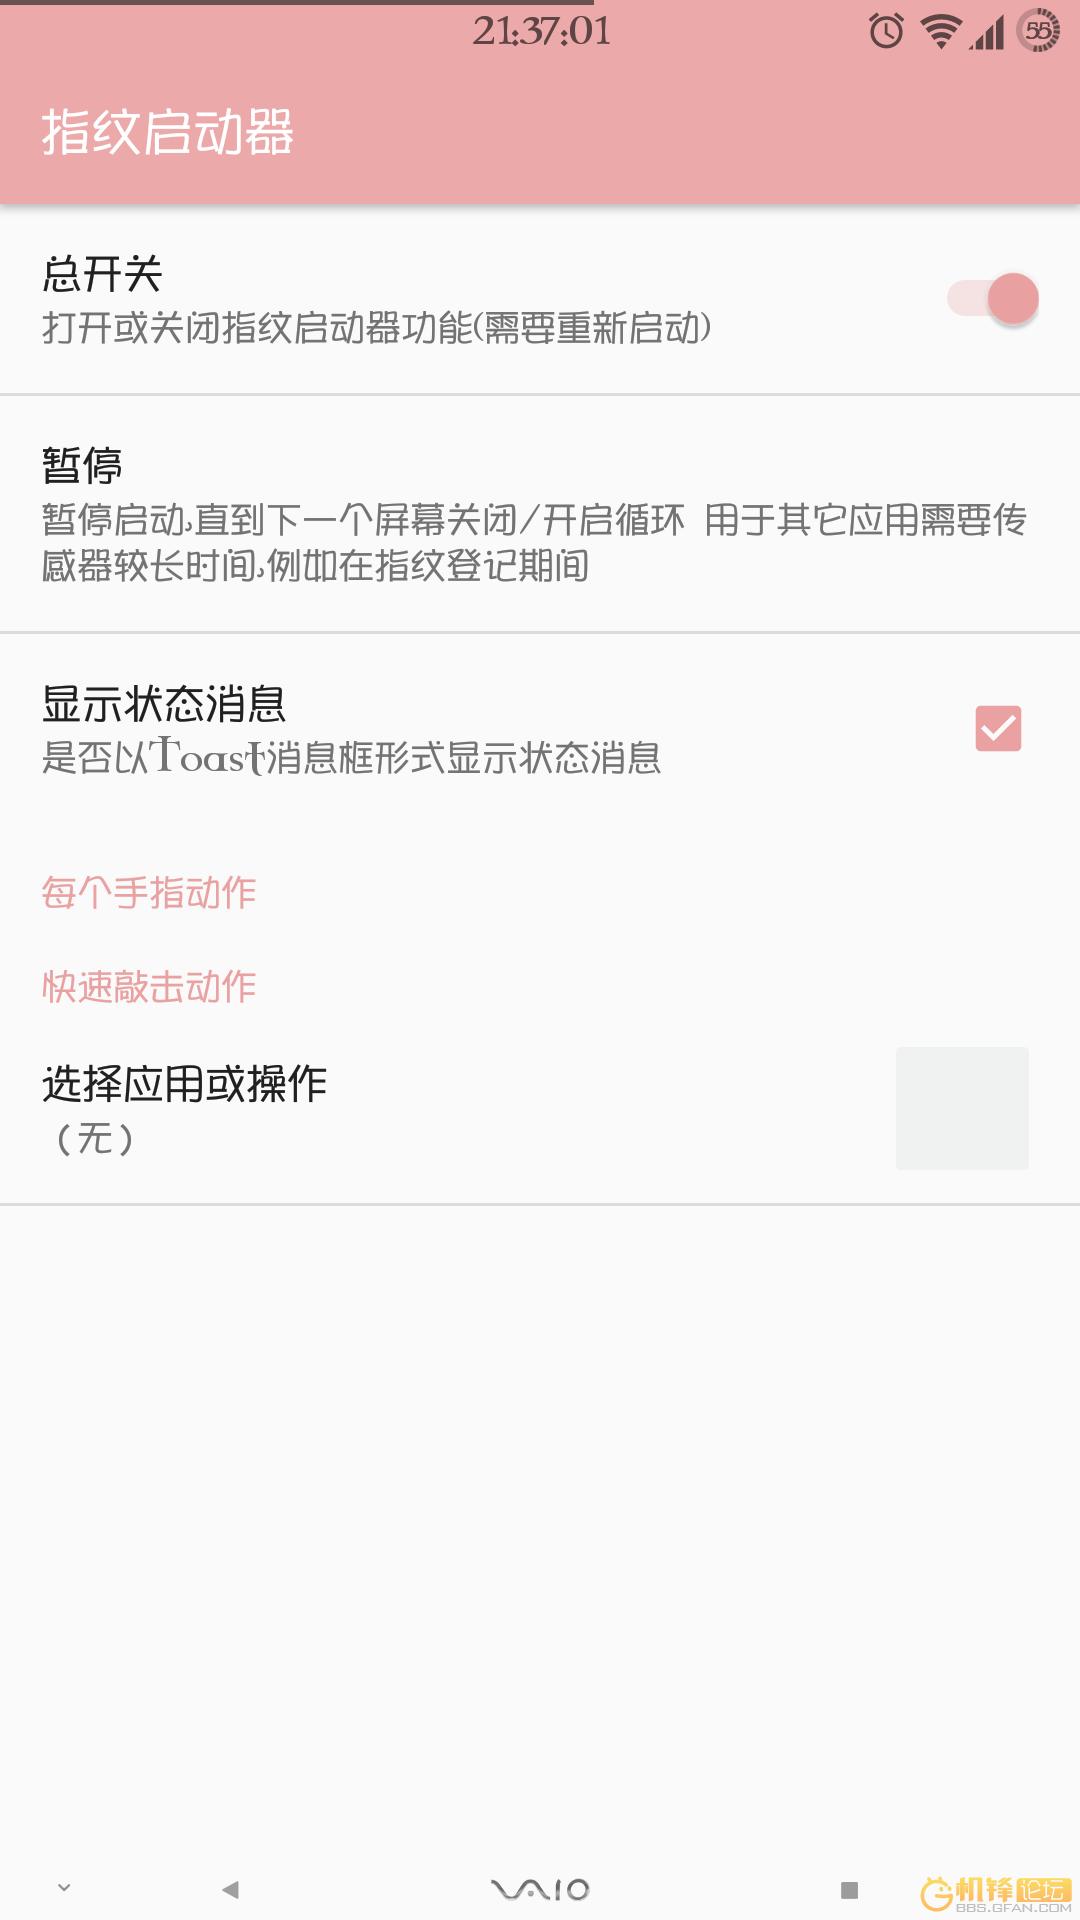 Screenshot_20180214-213703.png